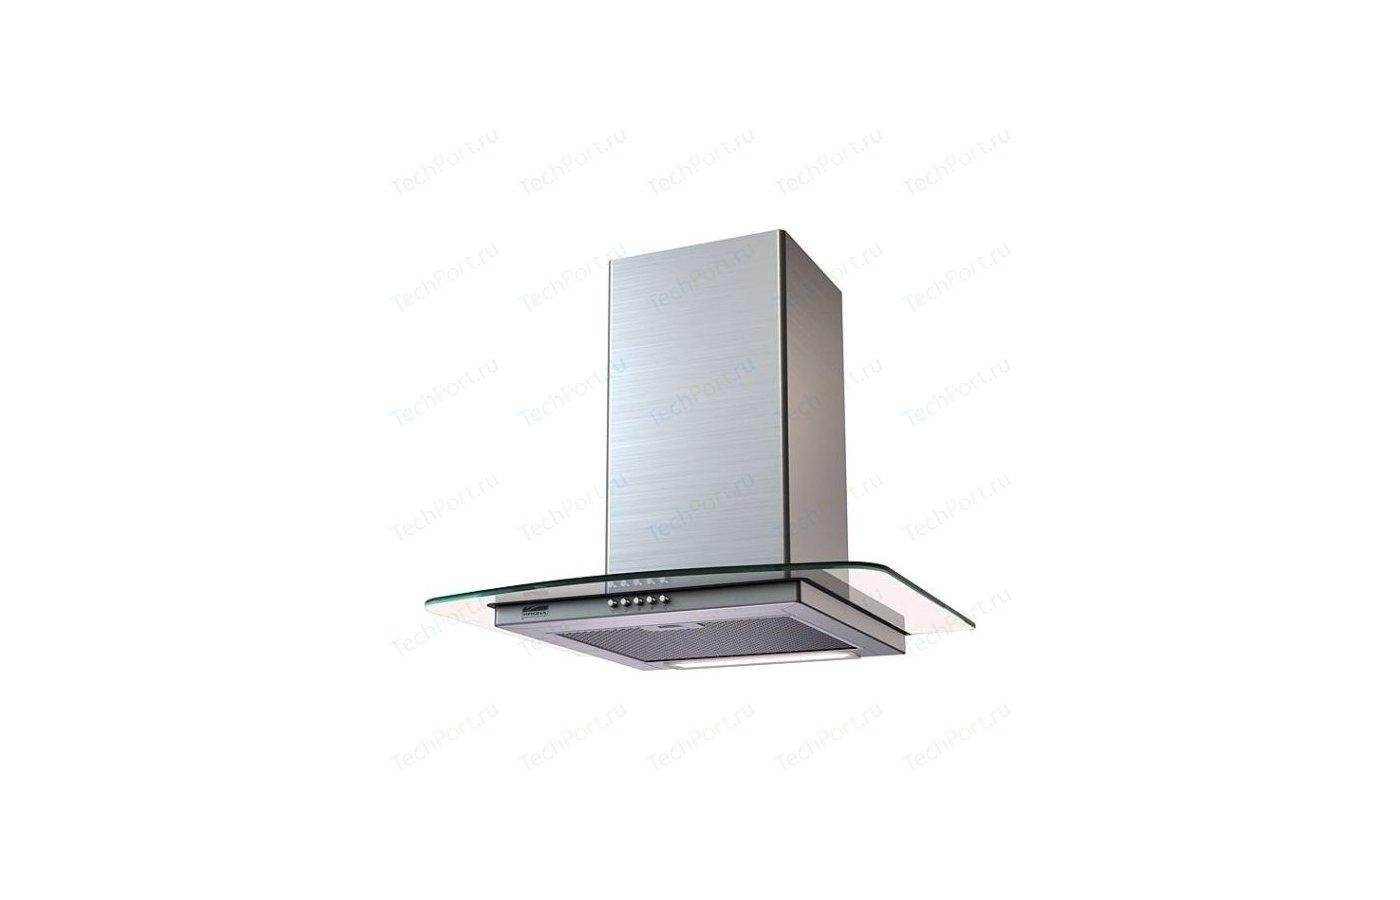 Вытяжка KRONA Jasmin 600 inox/glass push button